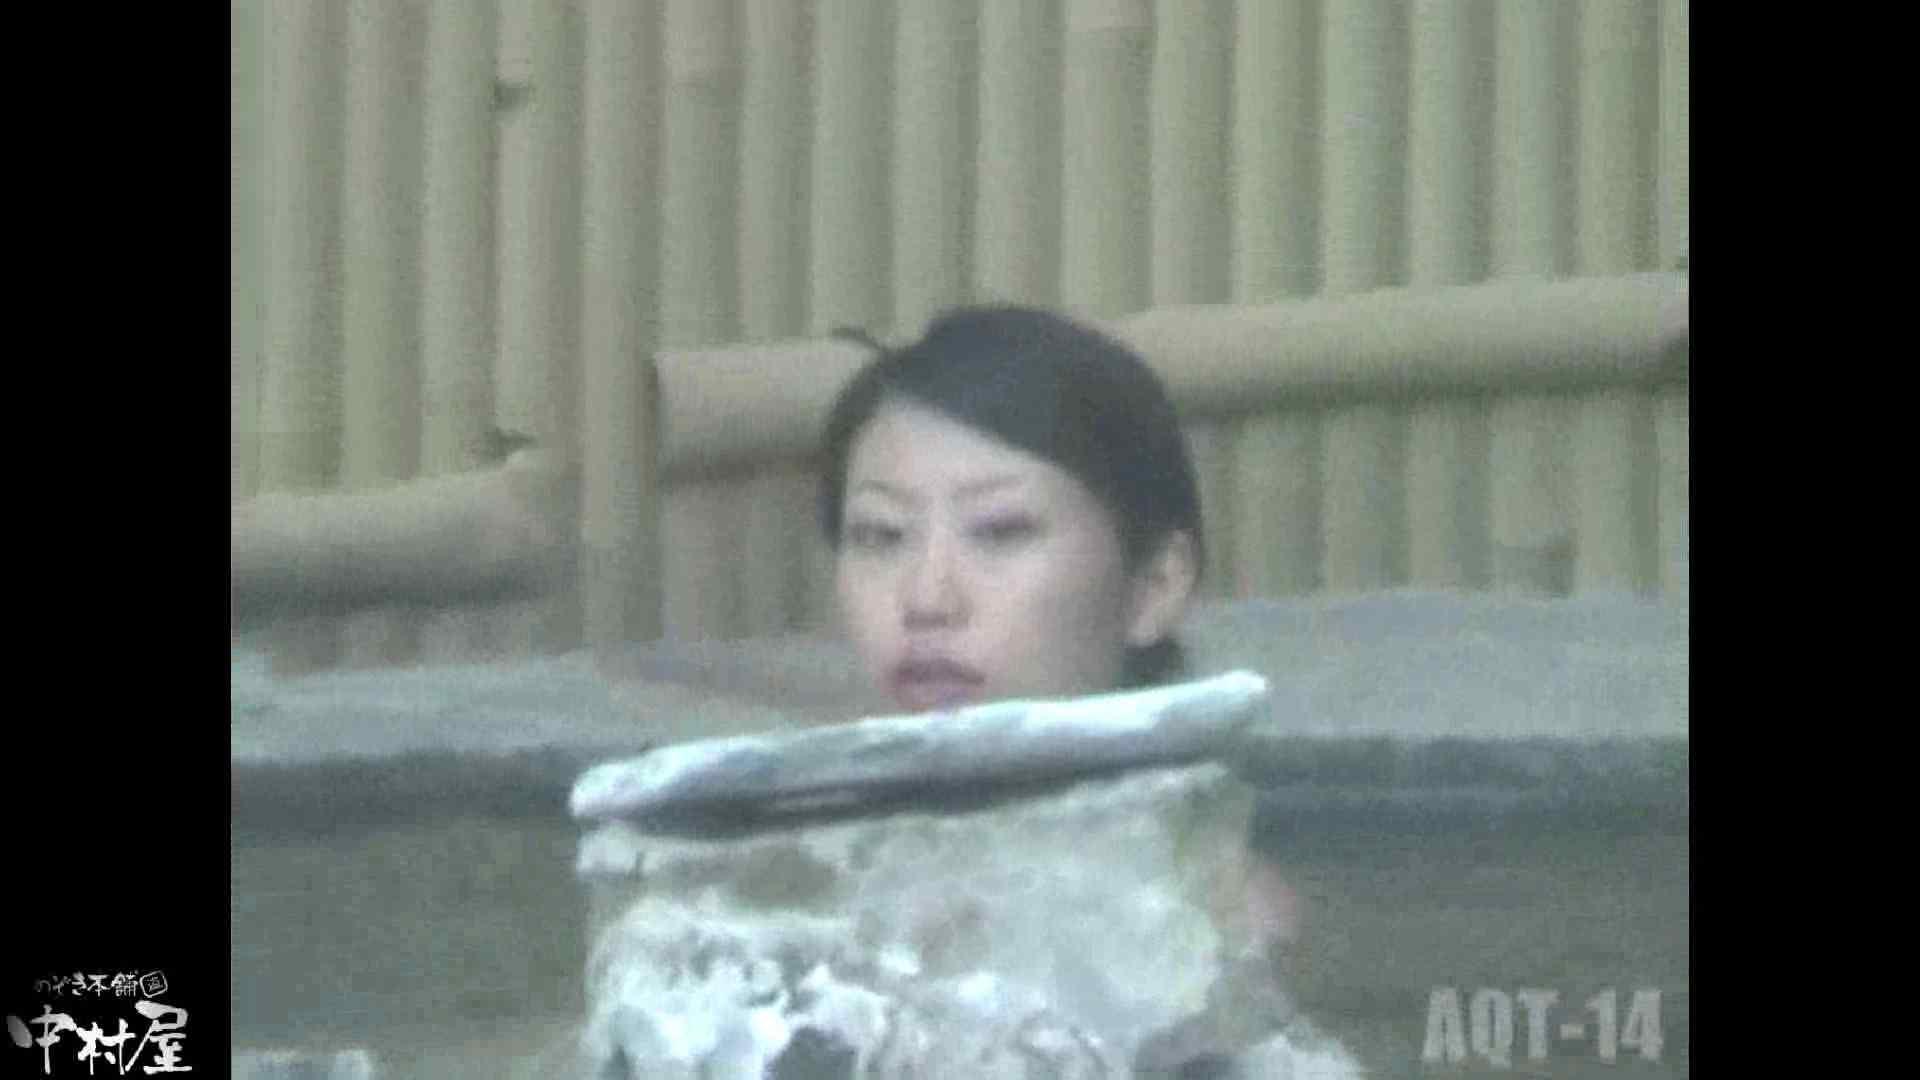 Aquaな露天風呂Vol.878潜入盗撮露天風呂十四判湯 其の一 潜入画像   露天  59画像 21